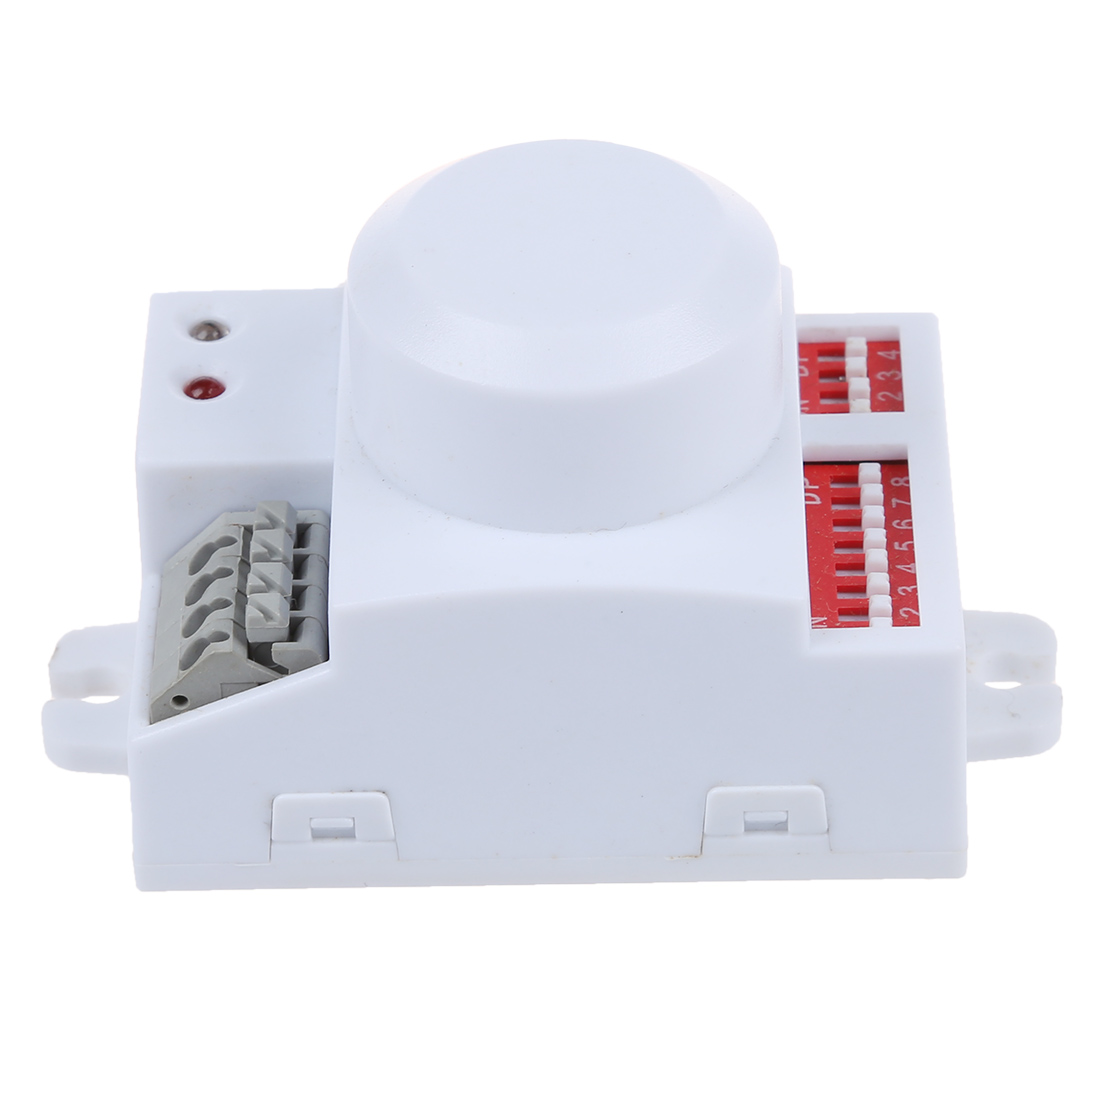 купить JFBL Hot Microwave motion sensor switch Doppler Radar Wireless Module for lighting 220V - White по цене 941.09 рублей